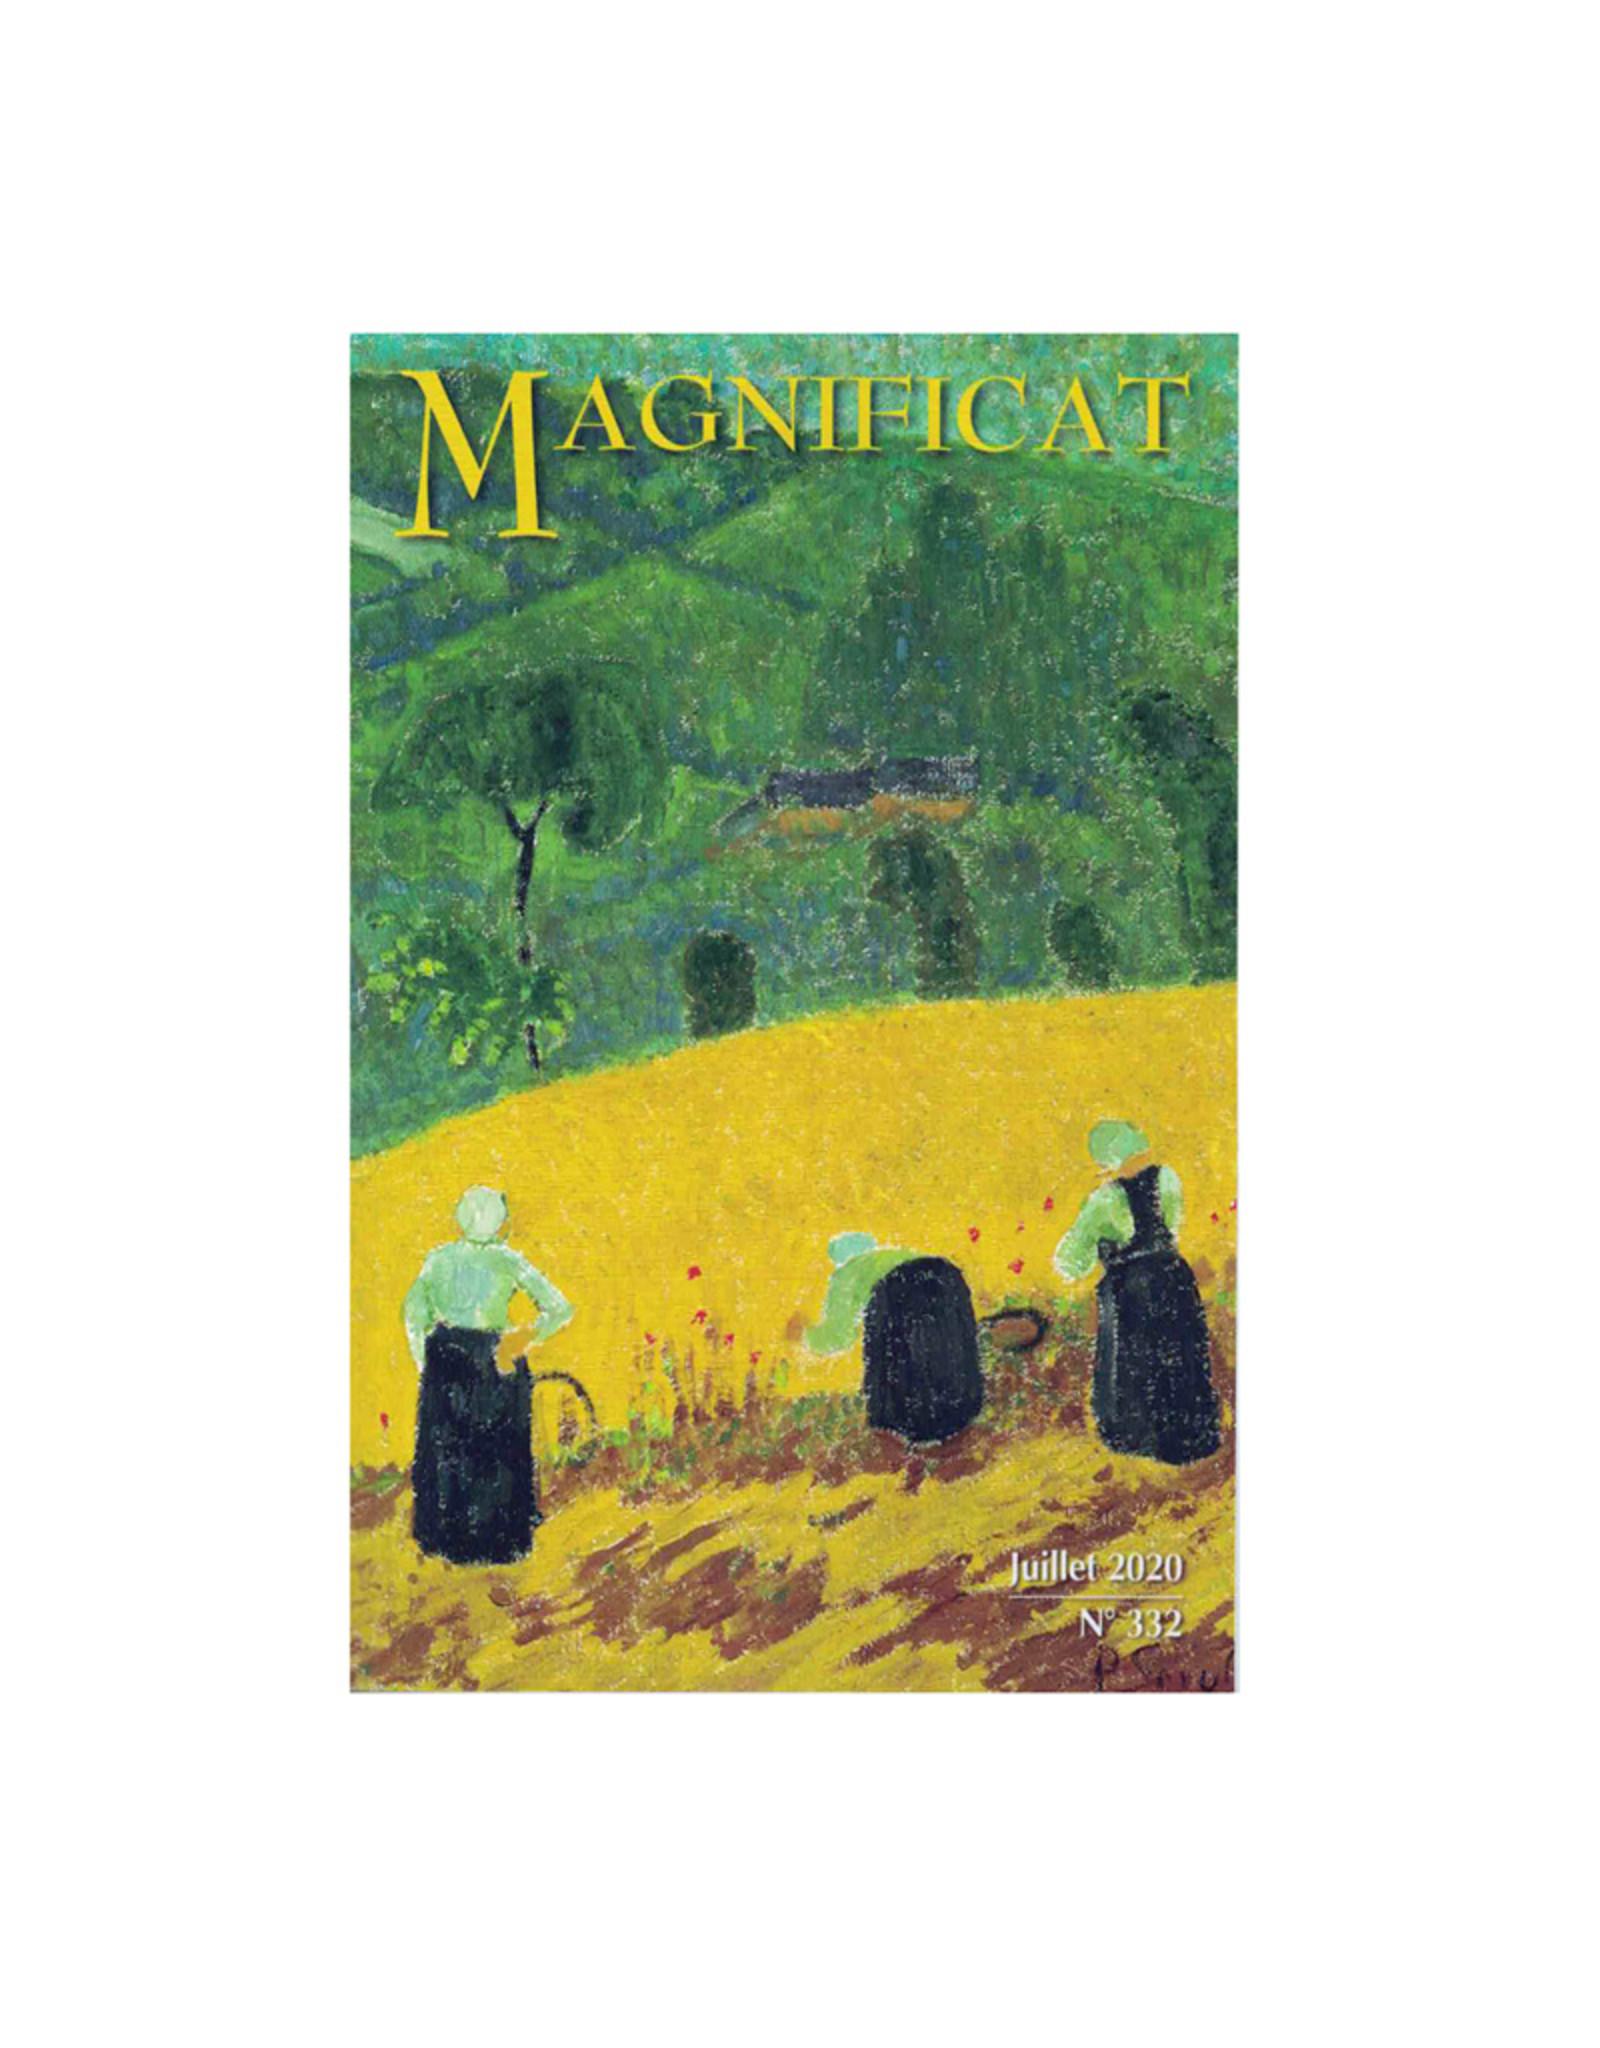 Magnificat -  Juillet 2020